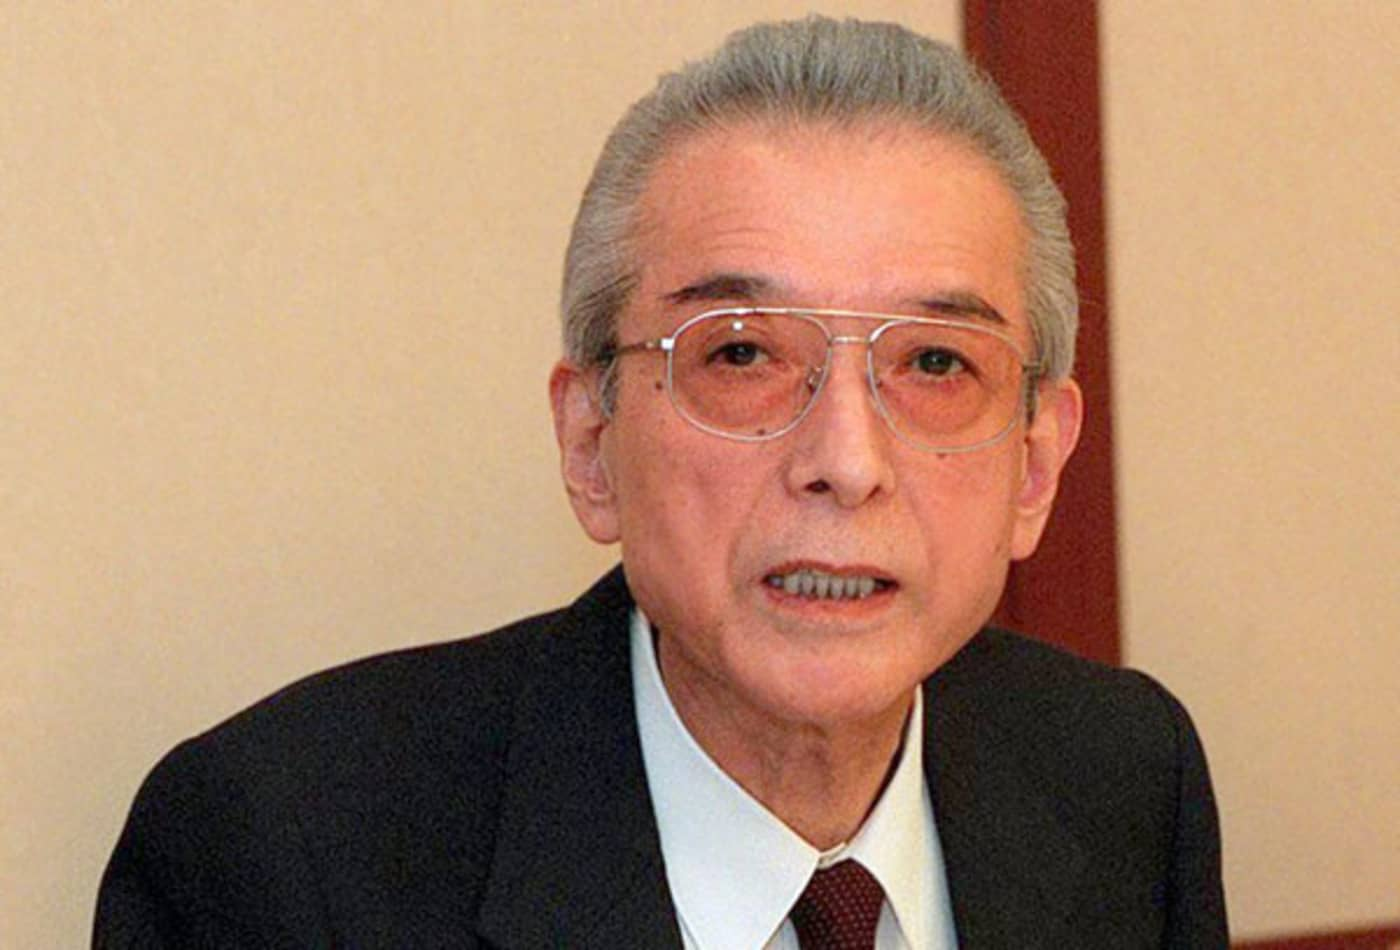 Hiroshi-Yamauchi-Billionaire-Sports-Team-Owners-CNBC.jpg